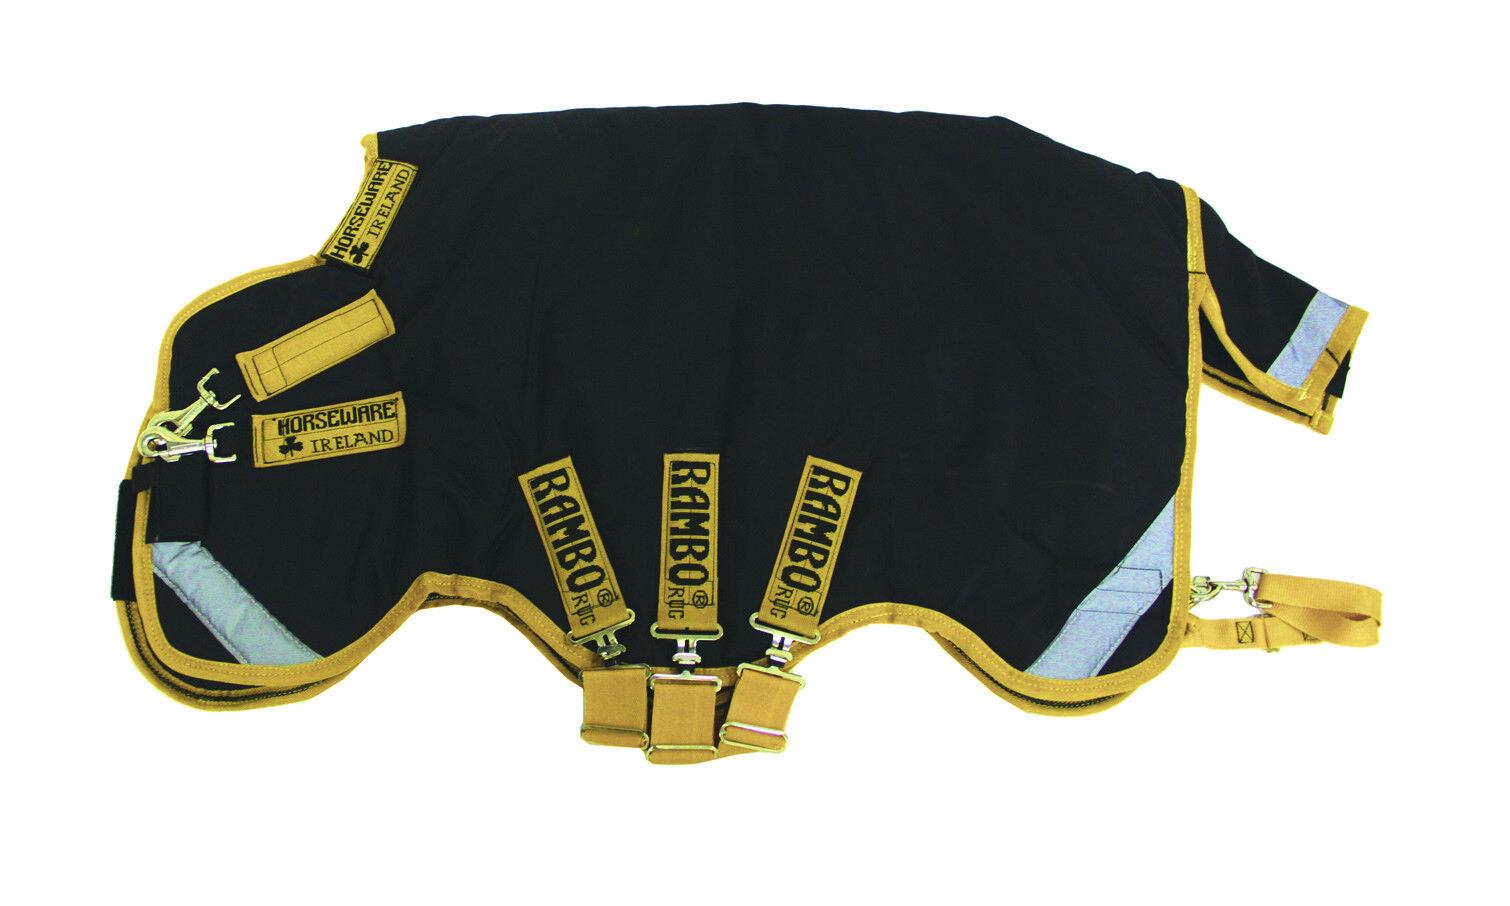 Horseware Ireland Rambo Supreme Turnout Blanket 0g Fill Waterproof